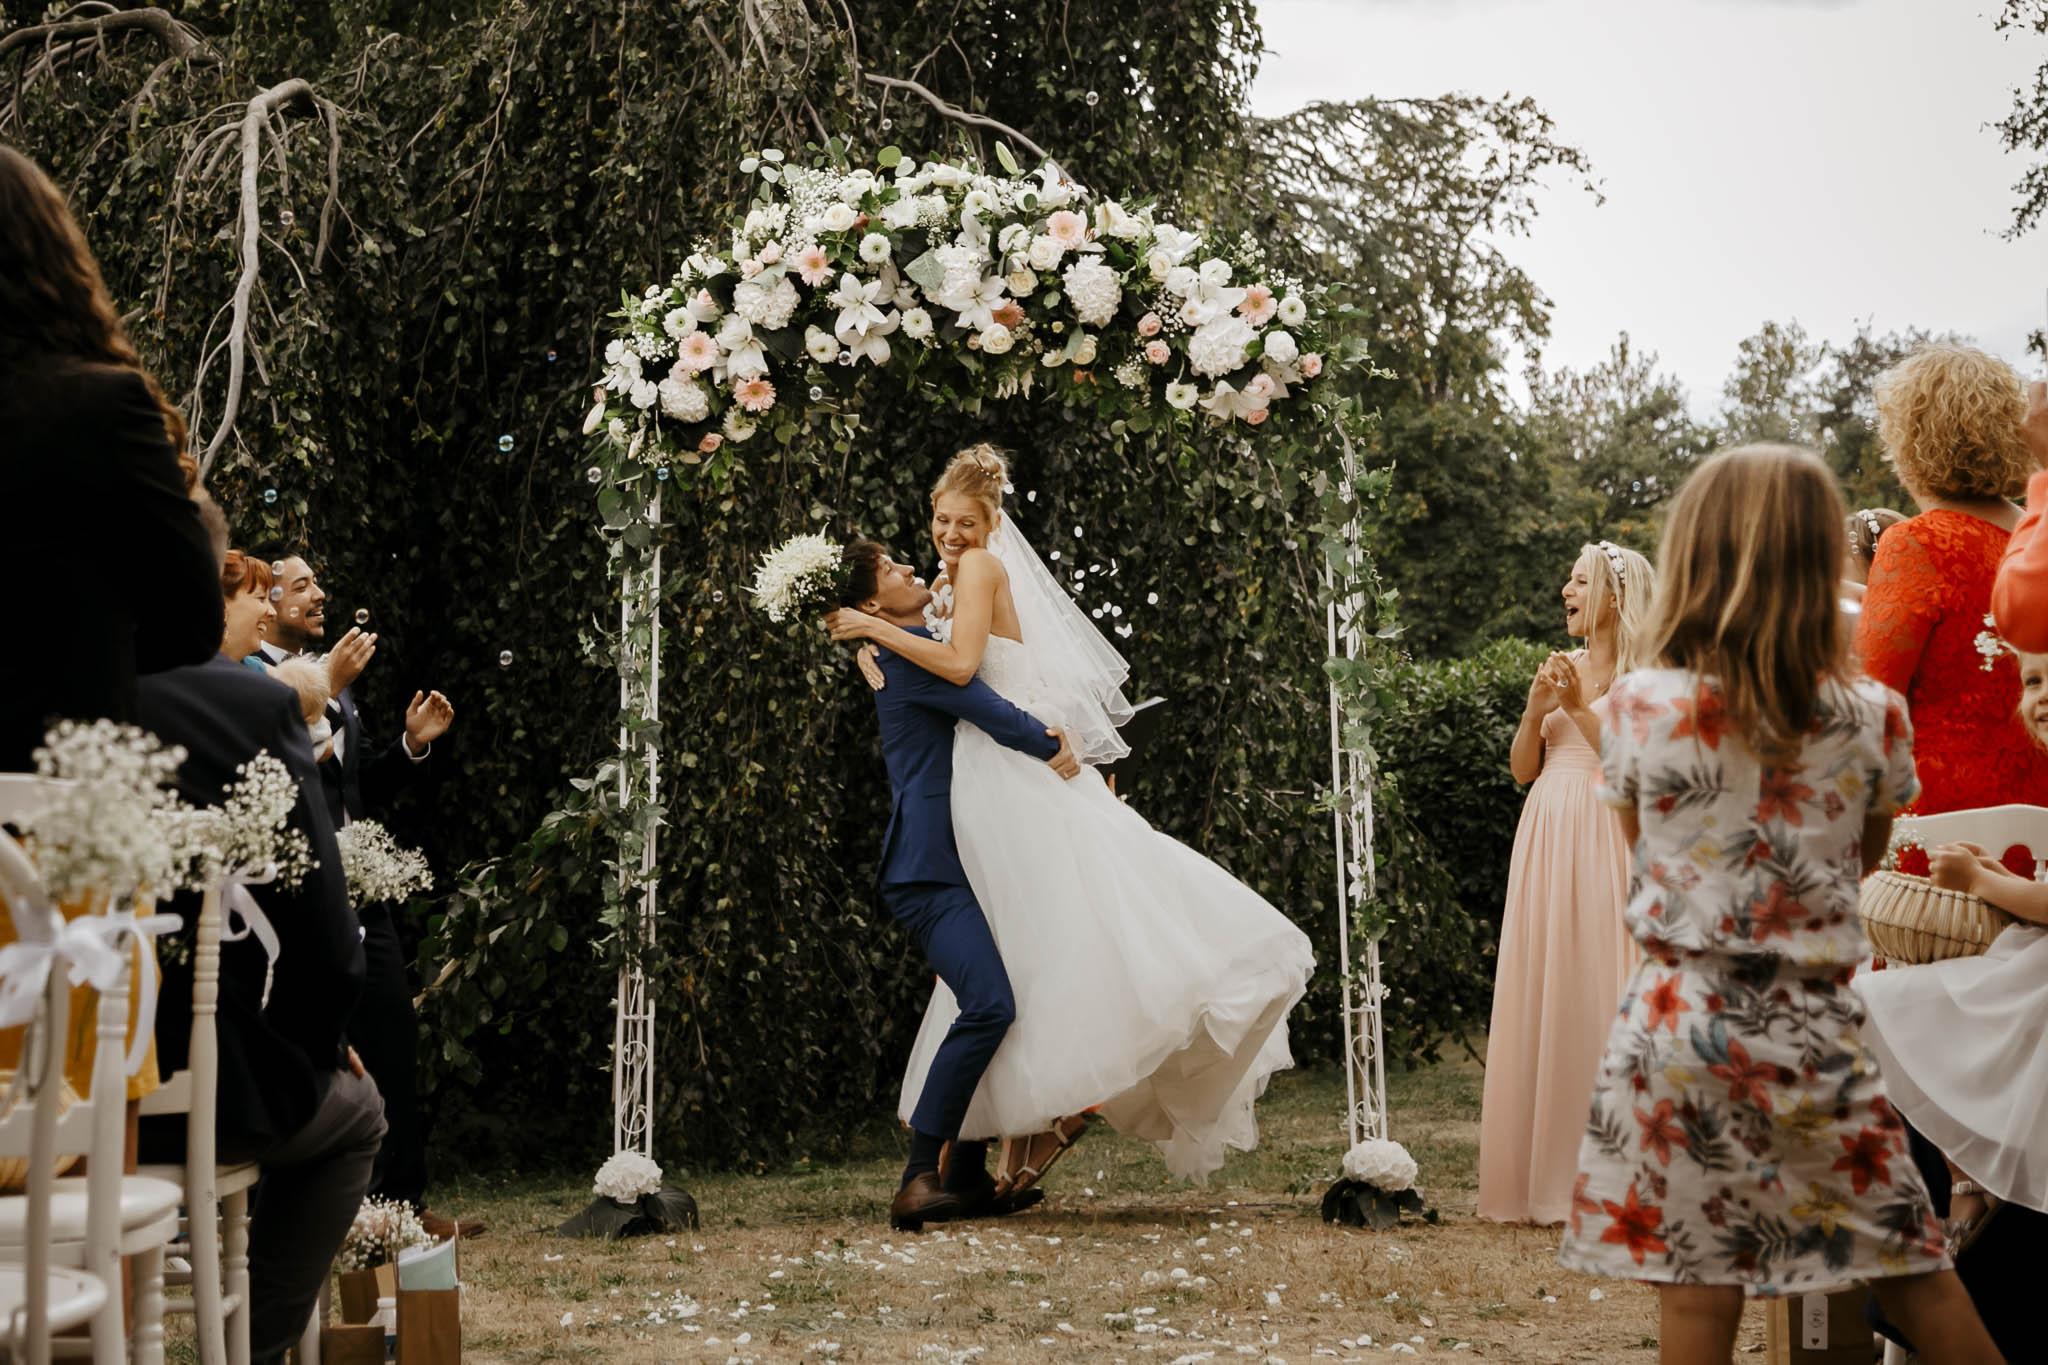 mariage-chateau-gaudras-ingold-53.jpg